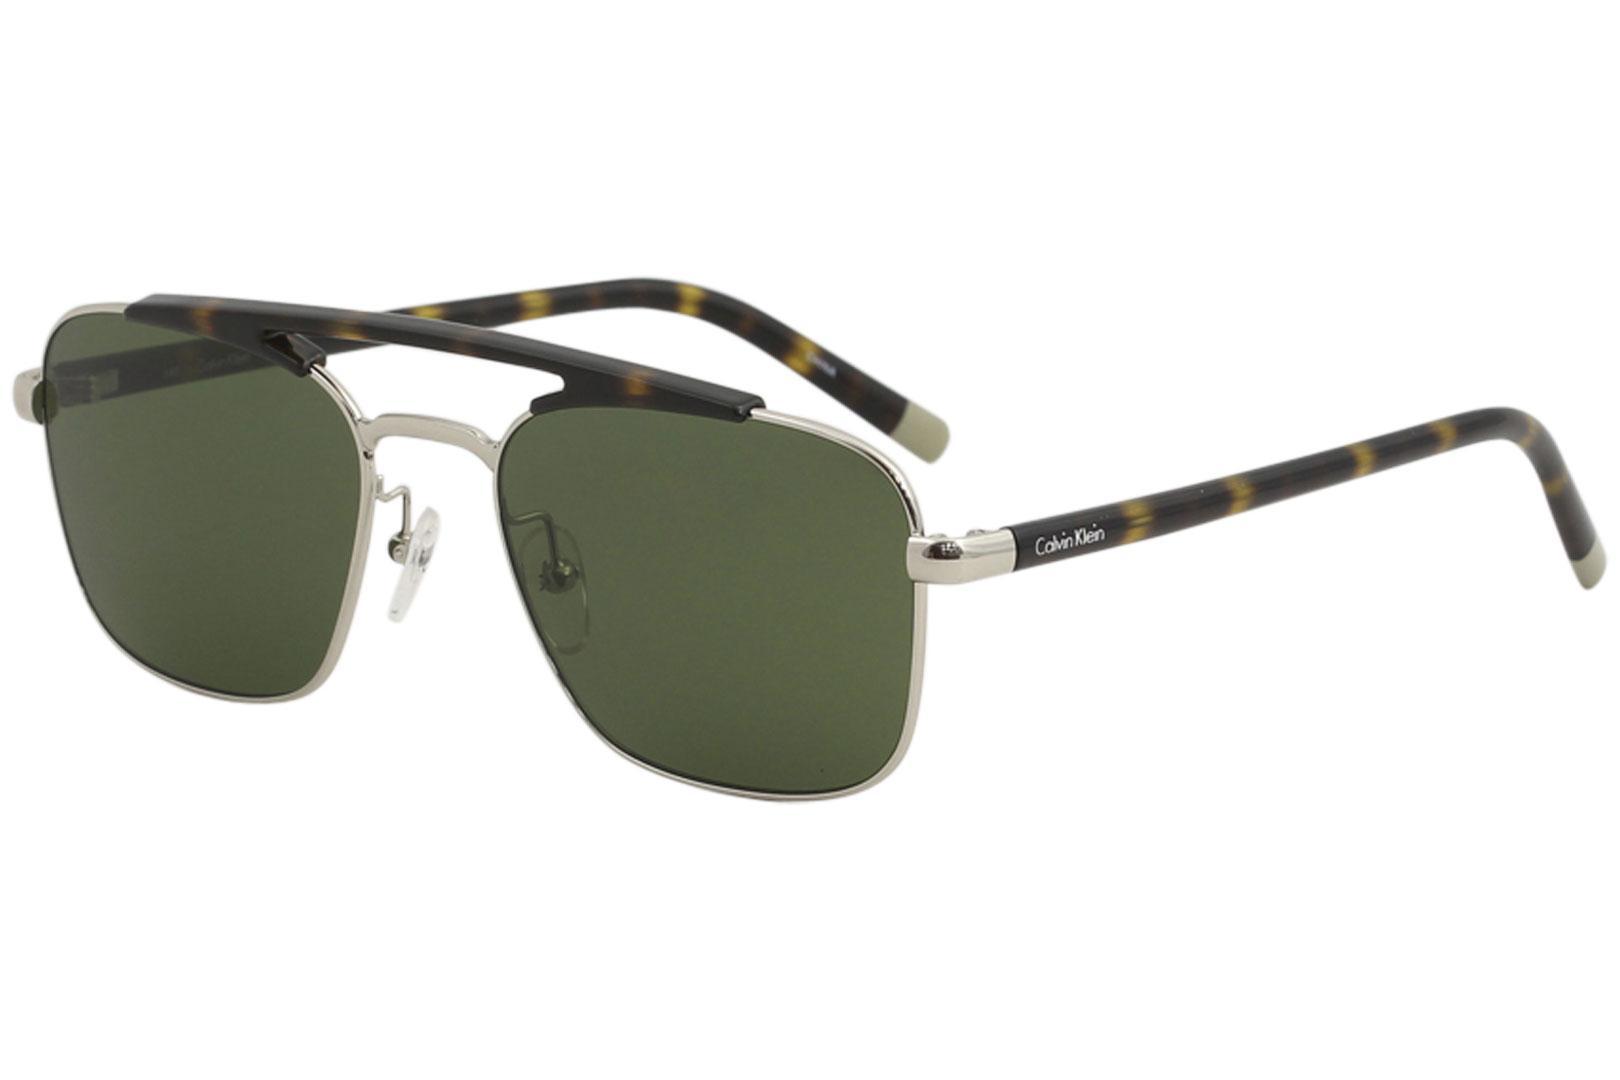 0e56fc5a836fa Calvin Klein Men s CK1221S CK 1221 S Fashion Pilot Sunglasses by Calvin  Klein